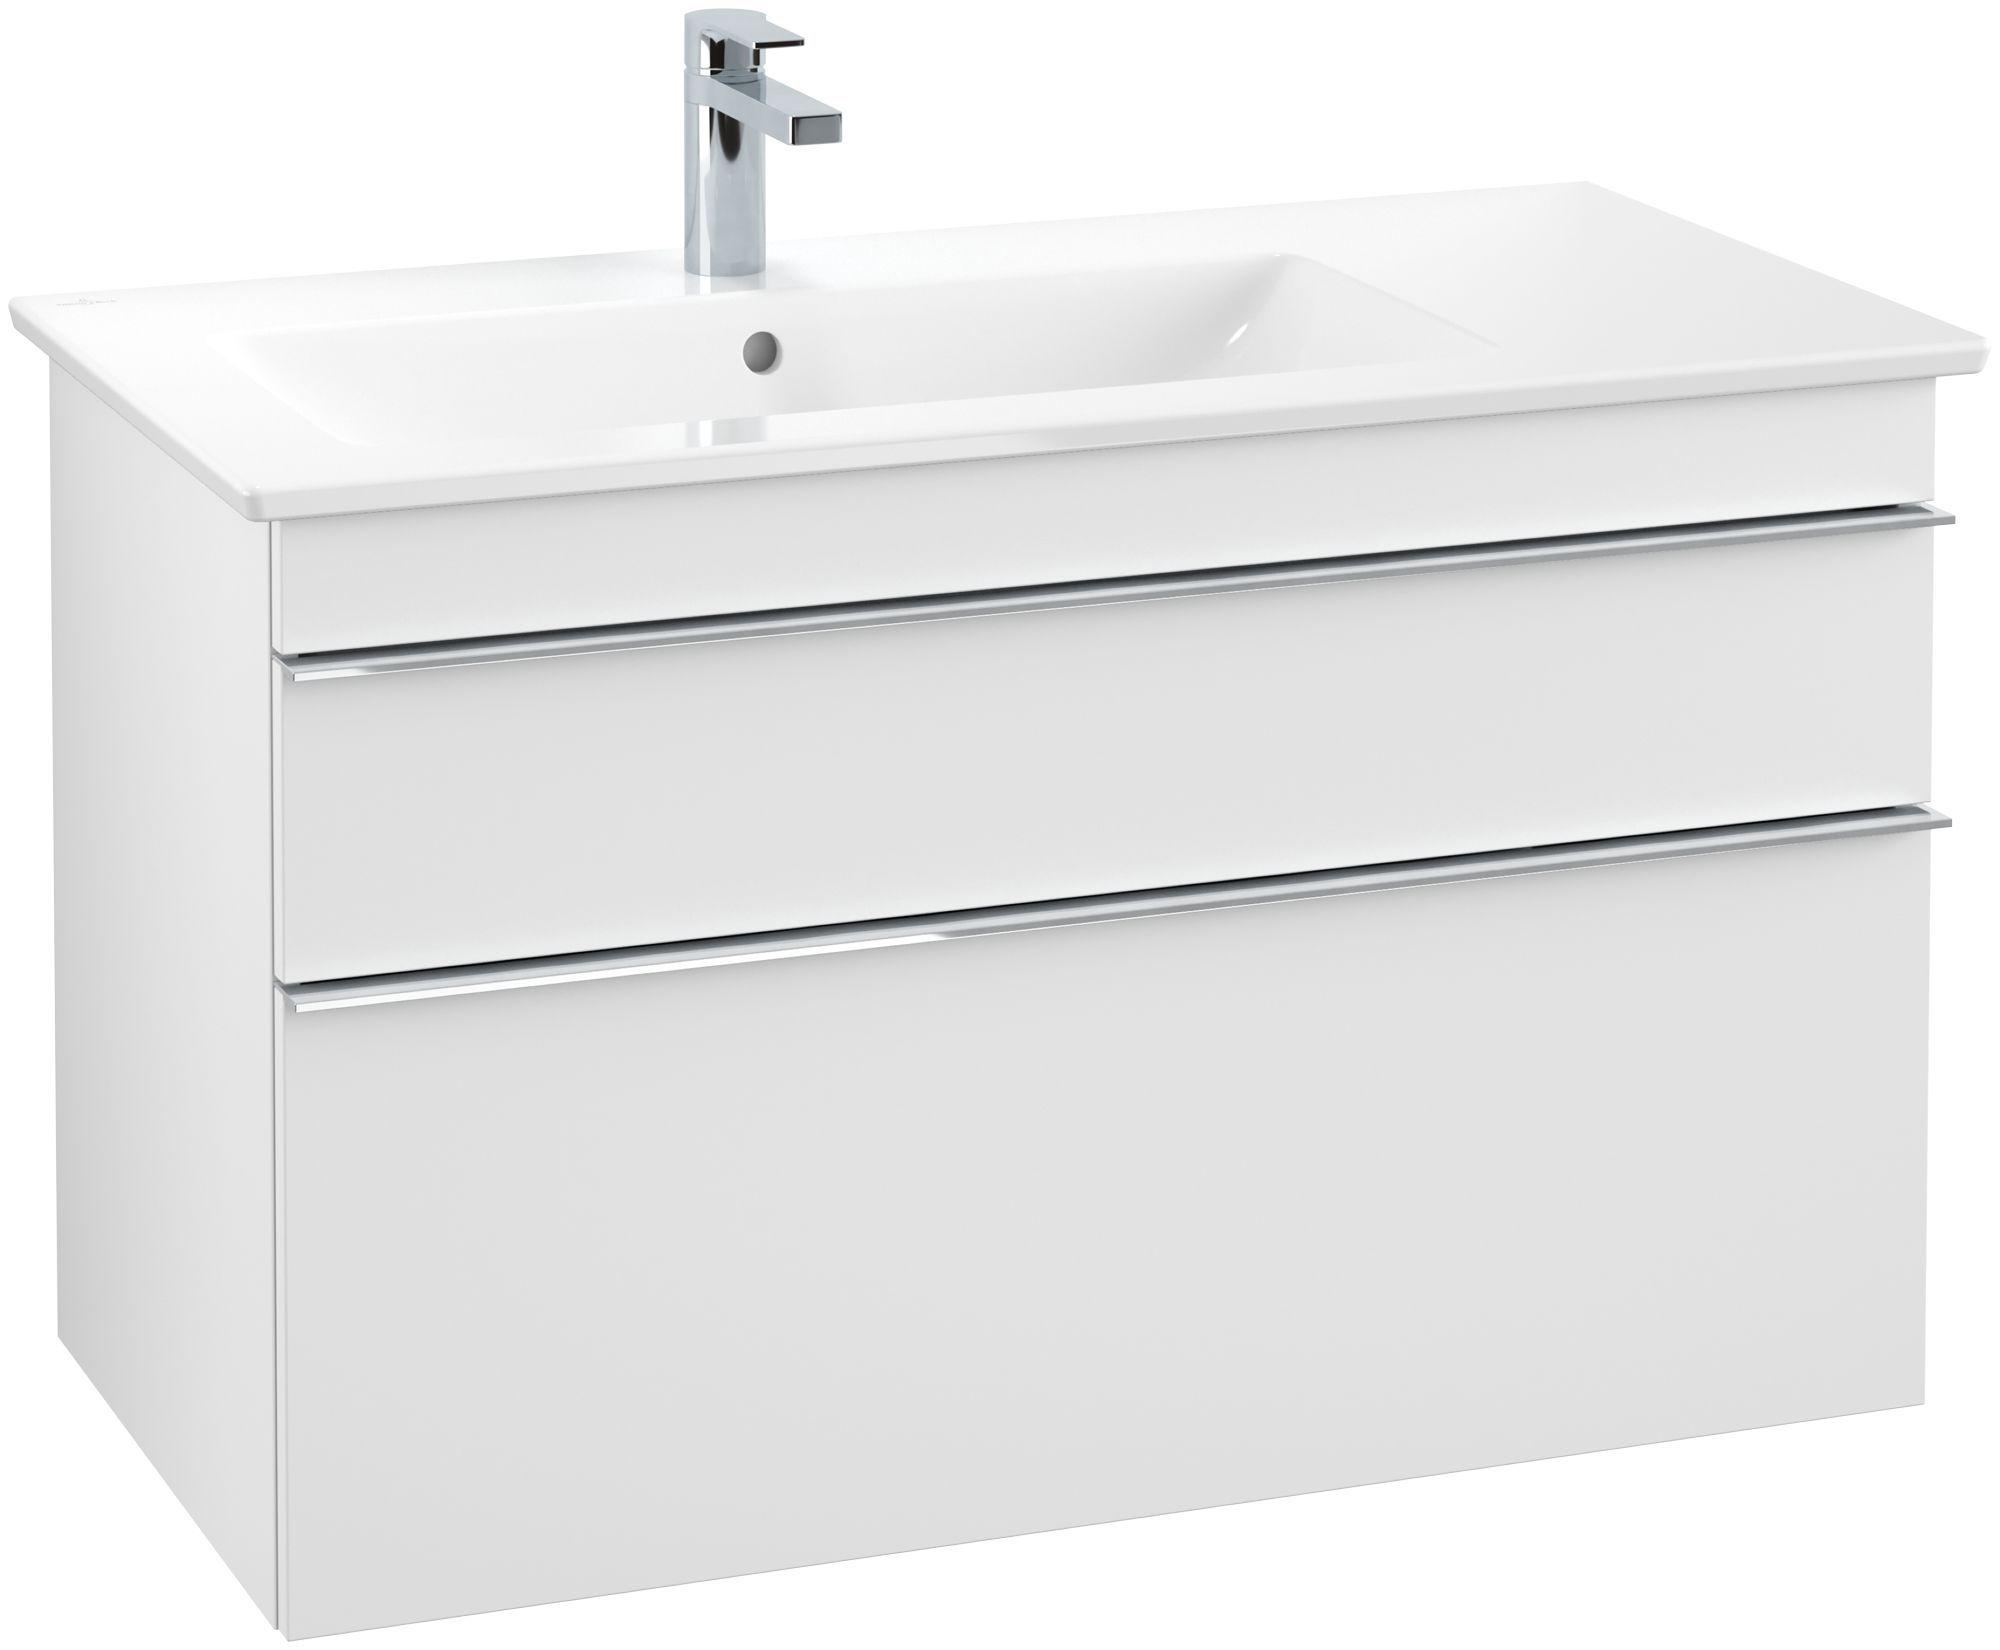 Villeroy & Boch Venticello Waschtischunterschrank 2 Auszüge B:953xT:502xH:590mm weiß matt Griffe chrom A92701MS